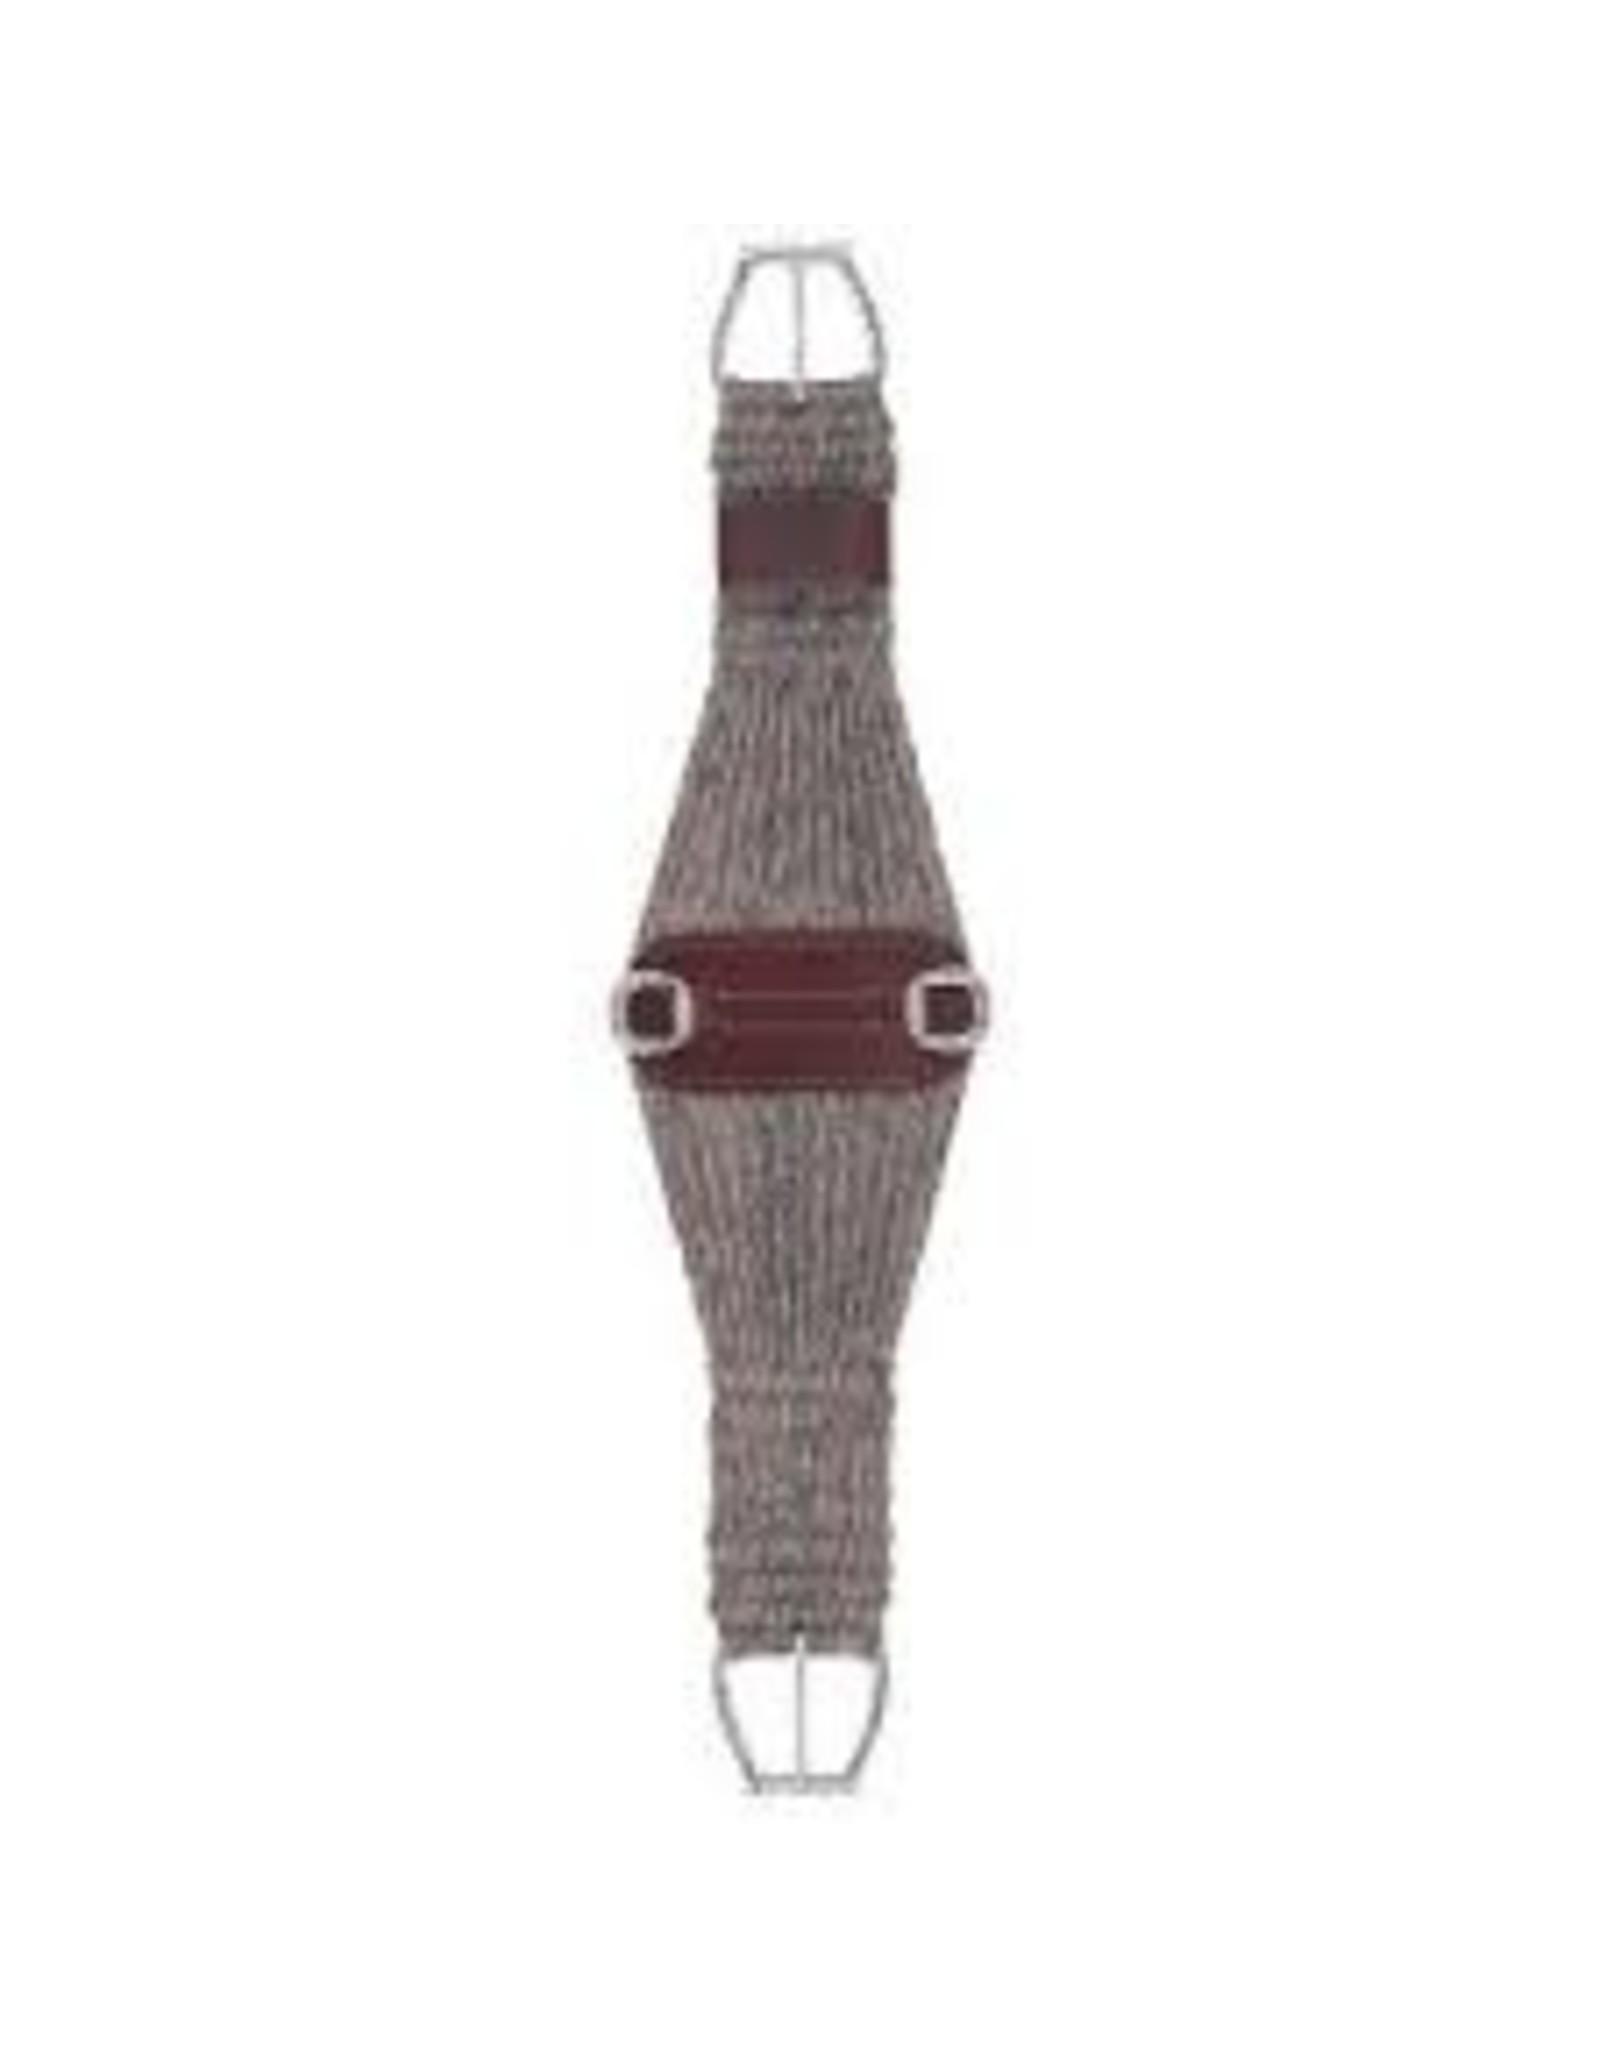 CIN* 100% Alpaca Roper Cinch 28''  35-2439-28  AAAA*P (fancy roller buckles and one side leather cinch holder)